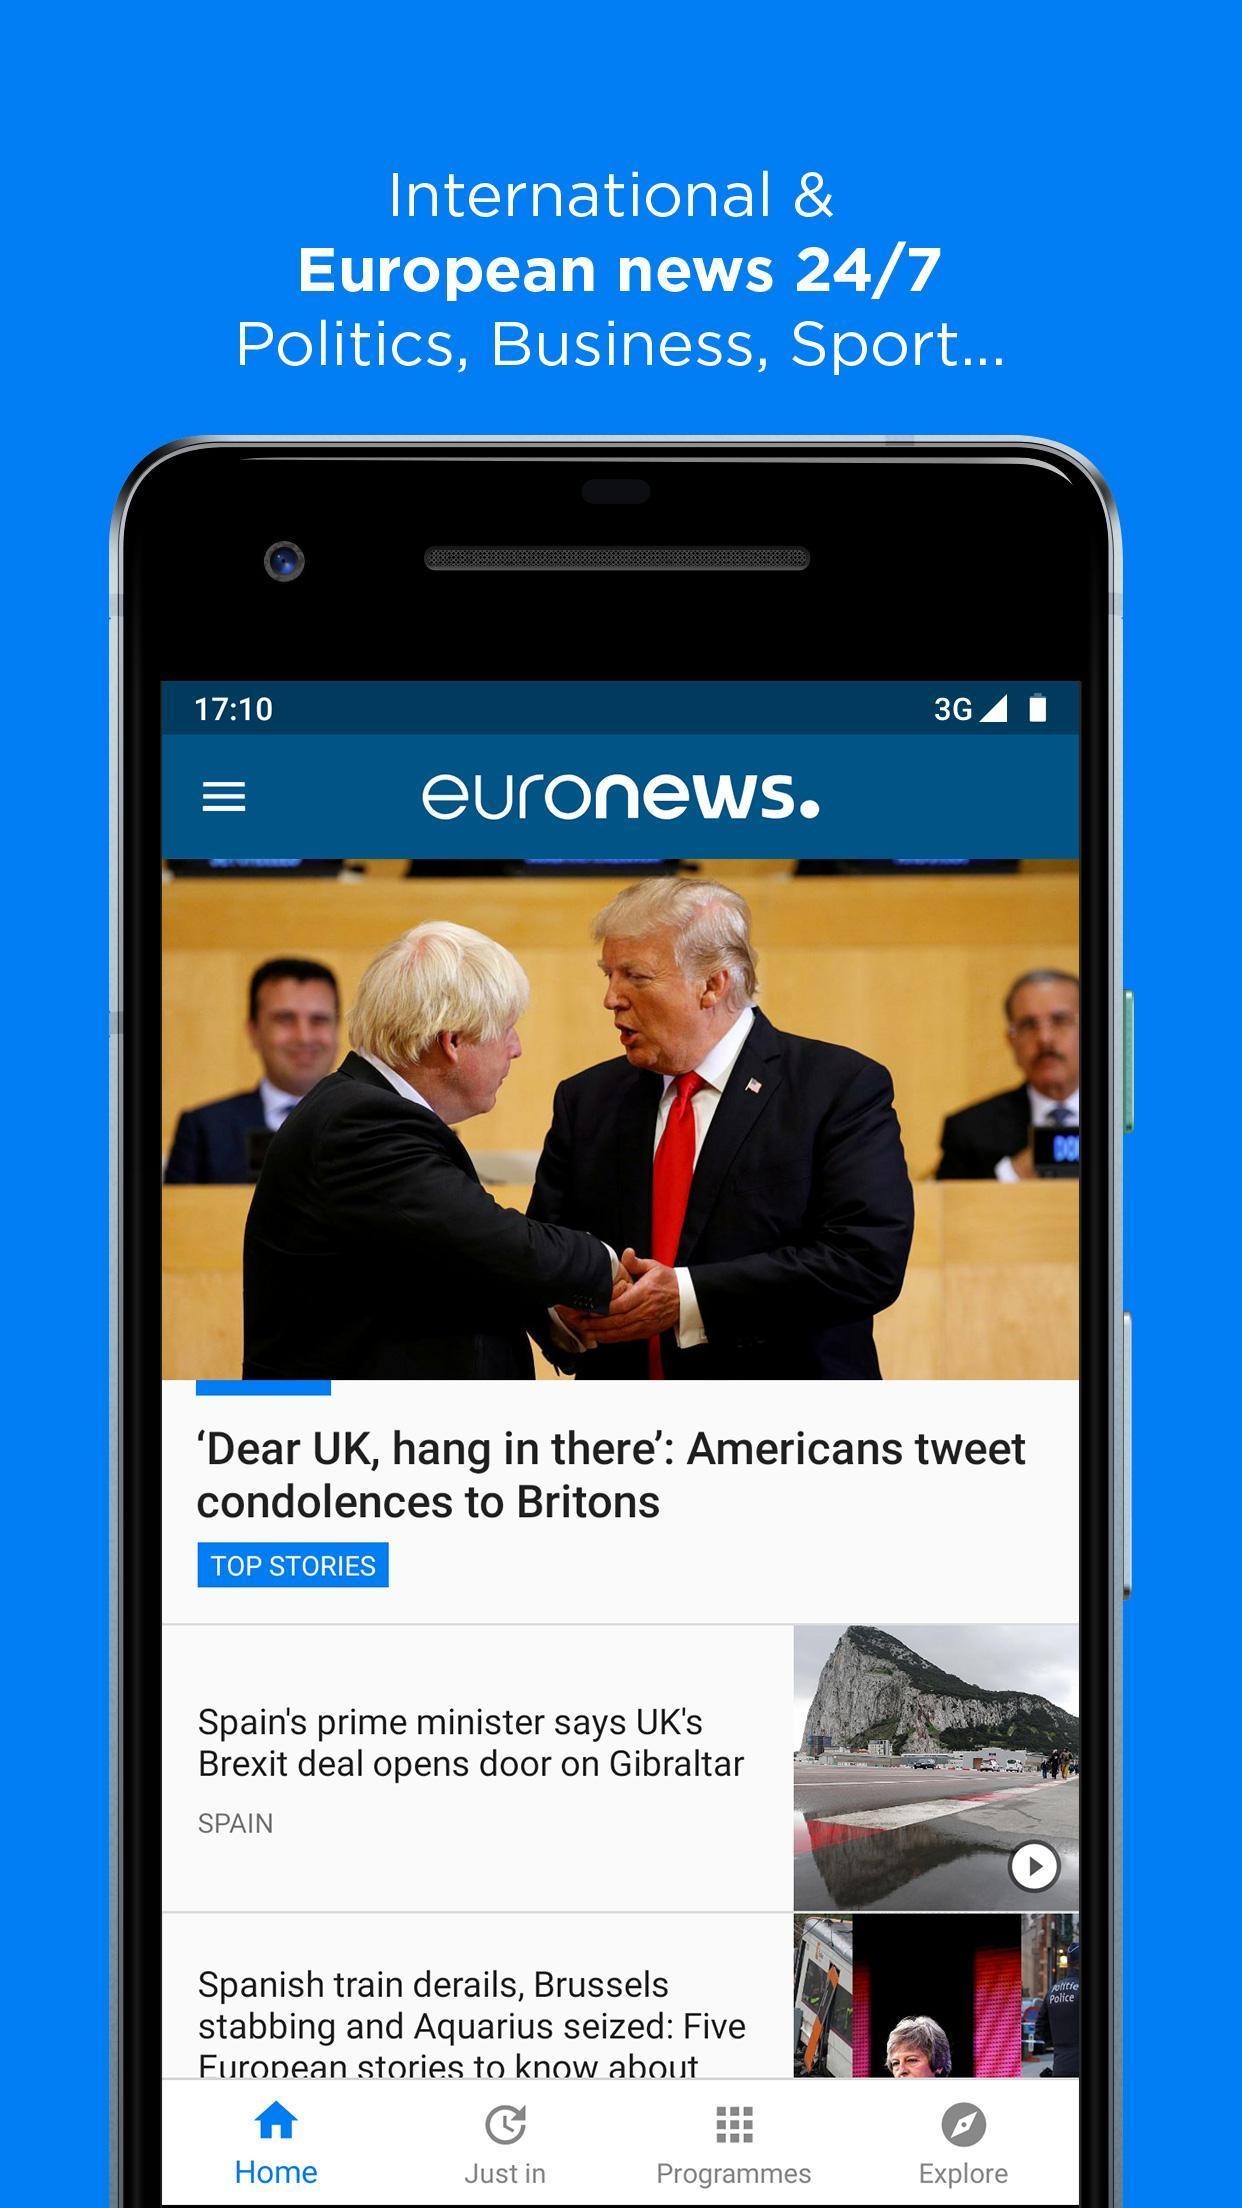 Euronews Daily breaking world news & Live TV 5.2.1 Screenshot 1